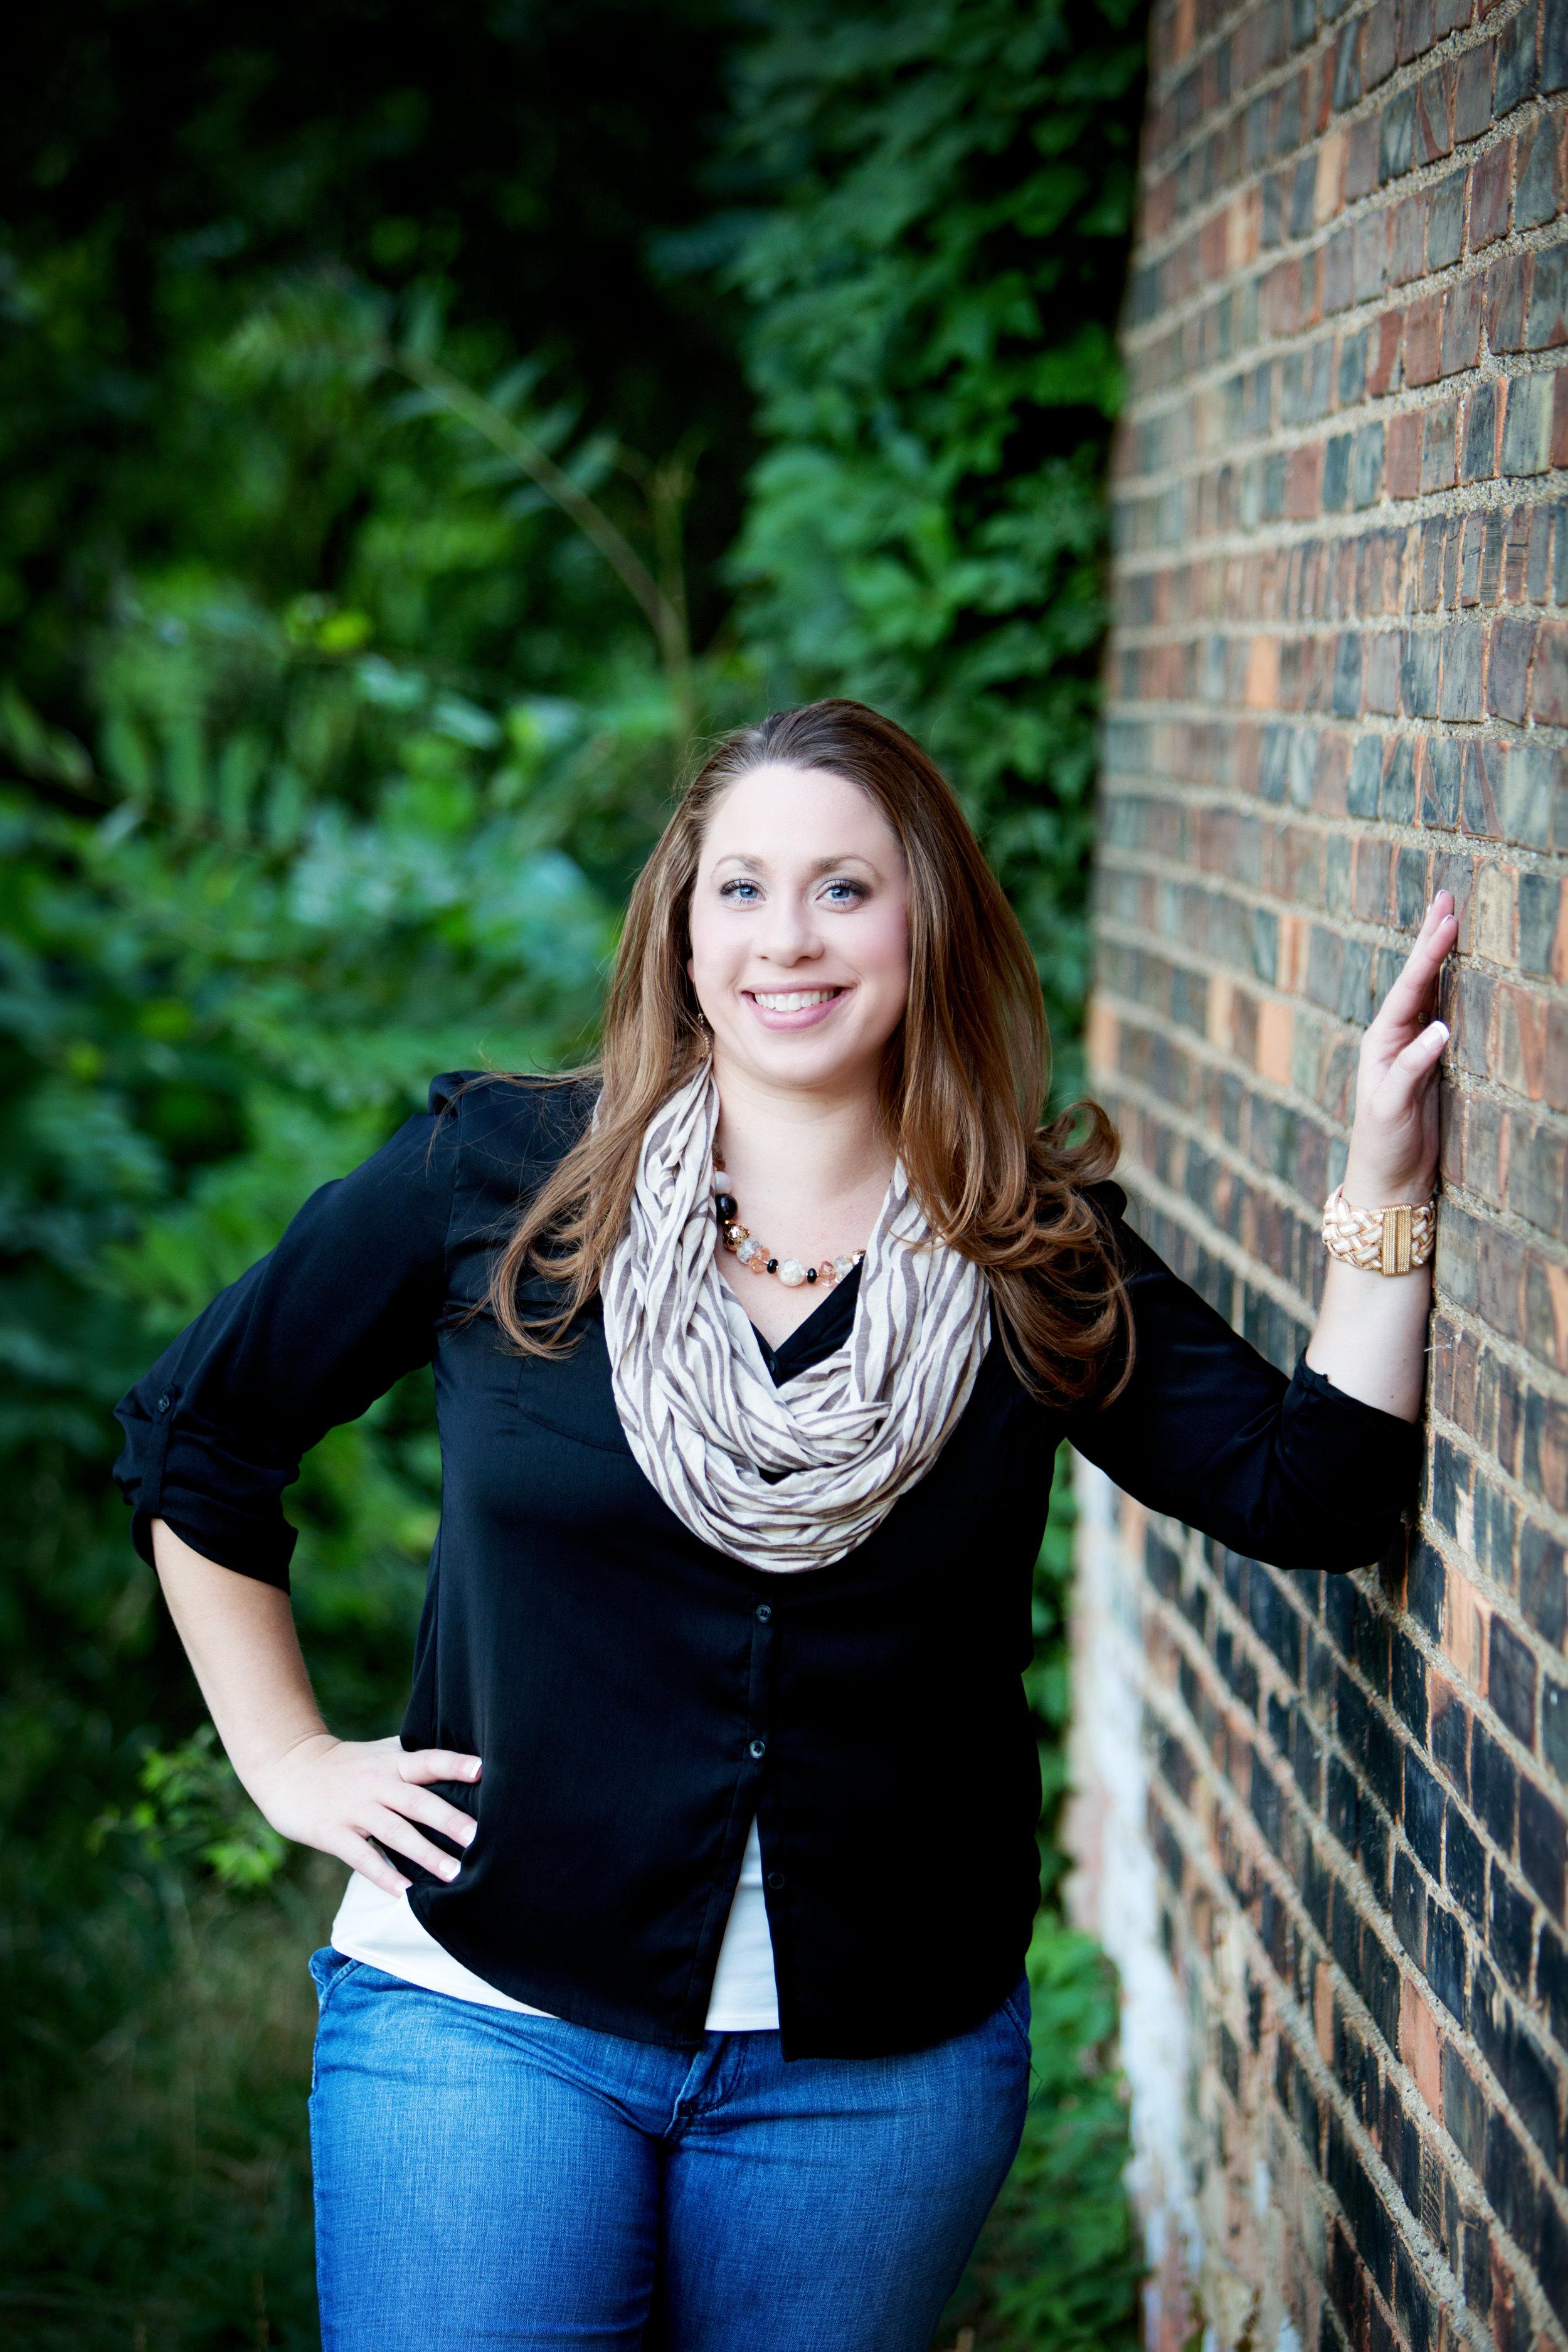 Joy Martinez, Personal Strengths Empowerment Coach, StrengthsDNA https://strengthsdna.com